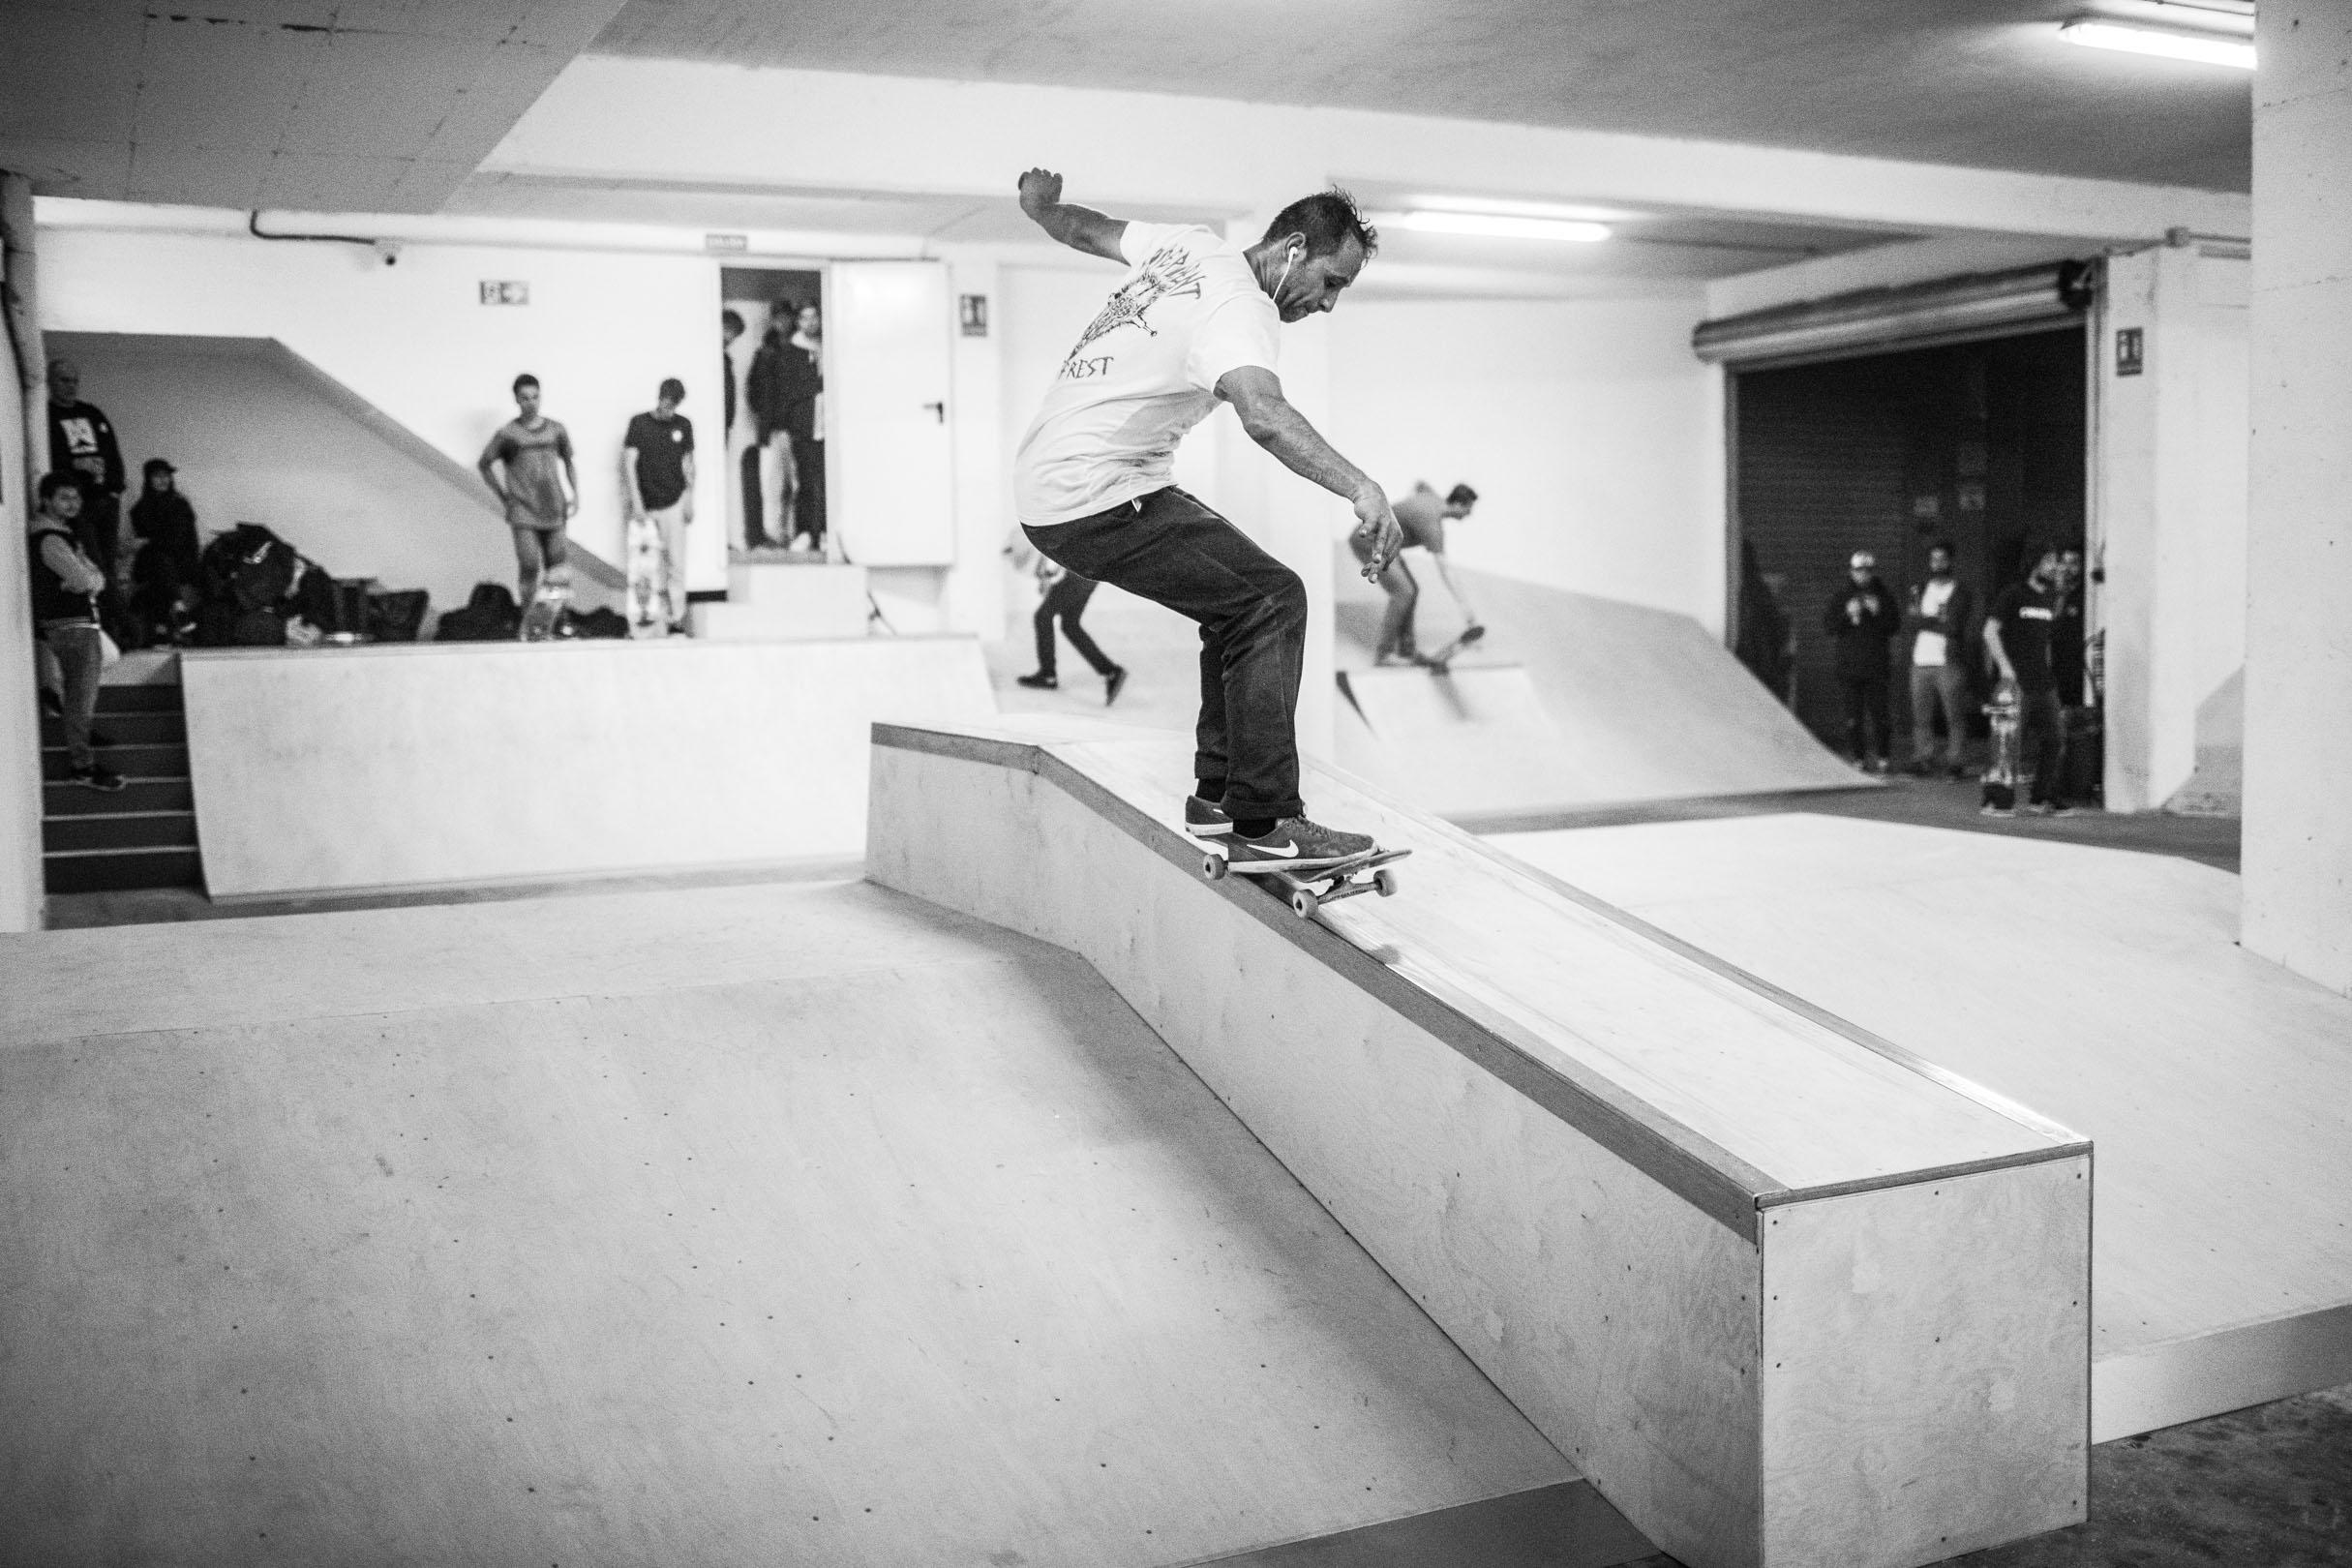 coruna-fotografia-skate-1.jpg